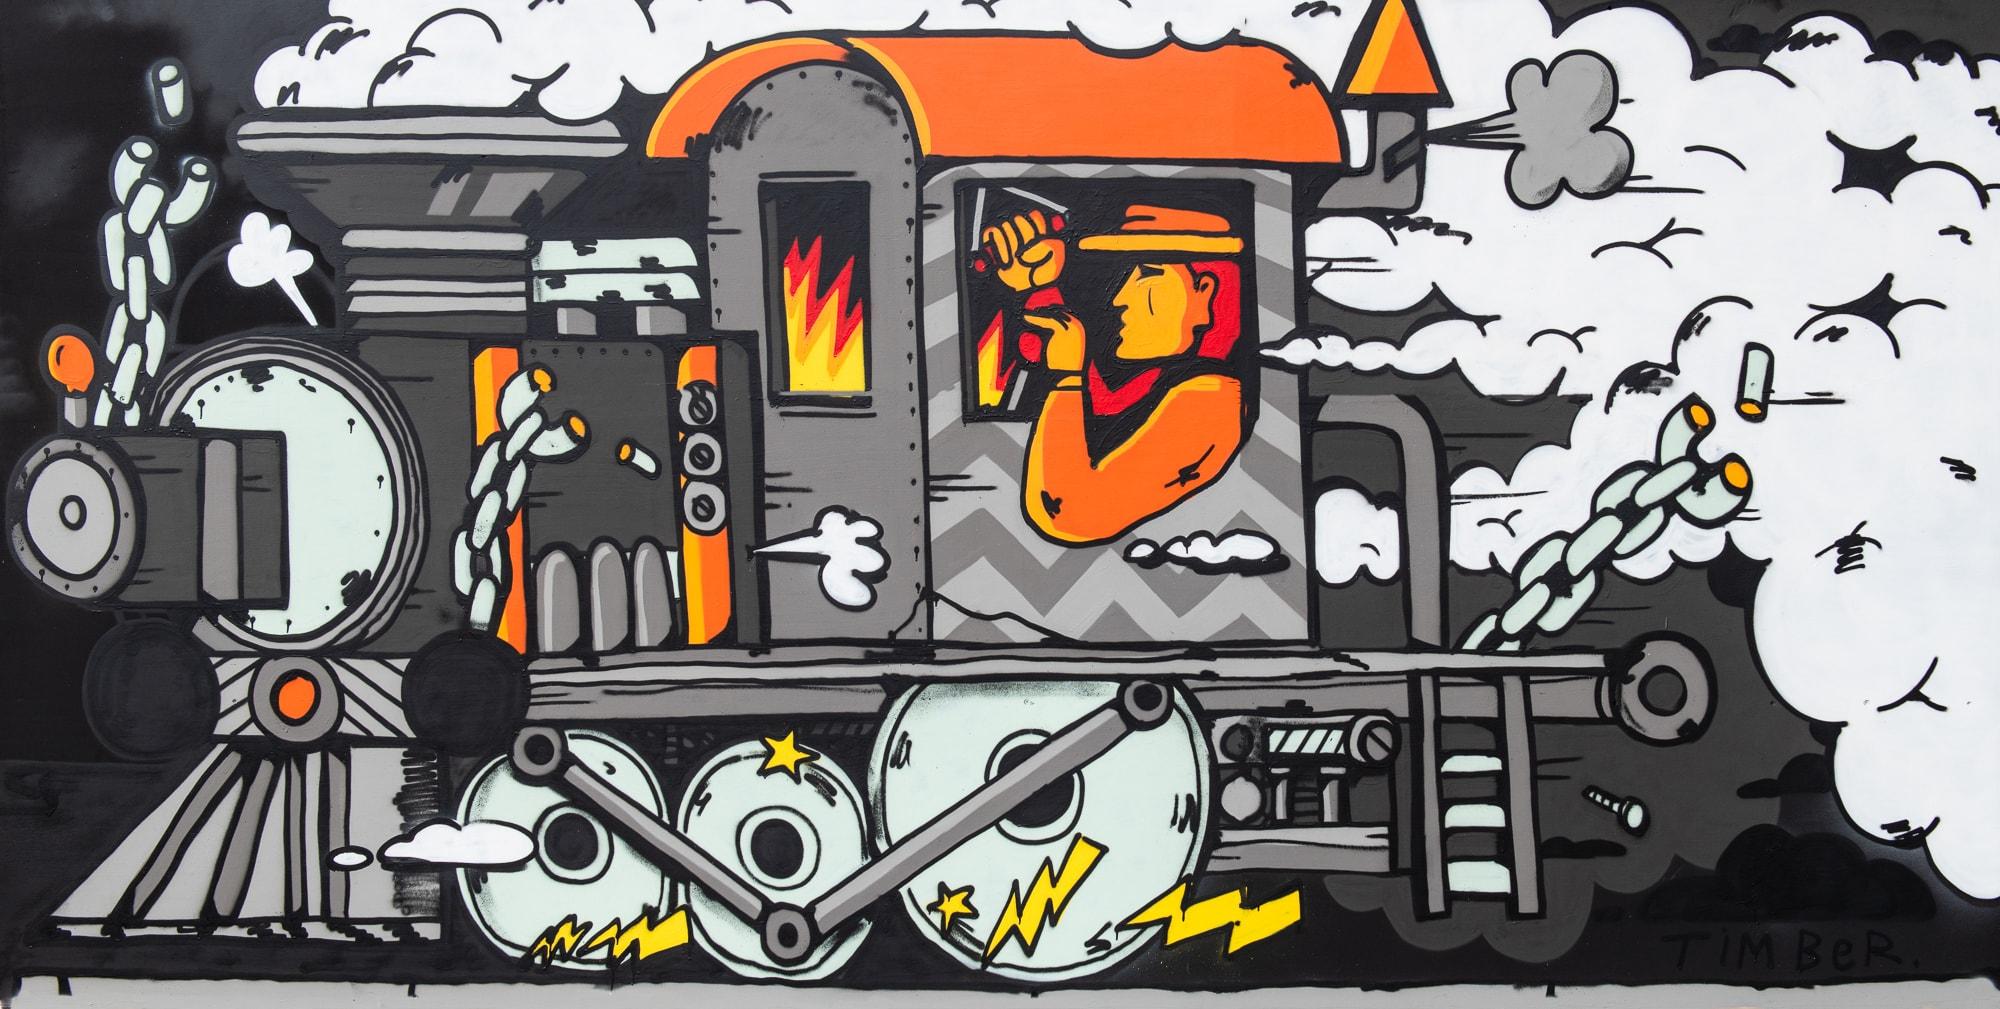 Streetart @ The Wall